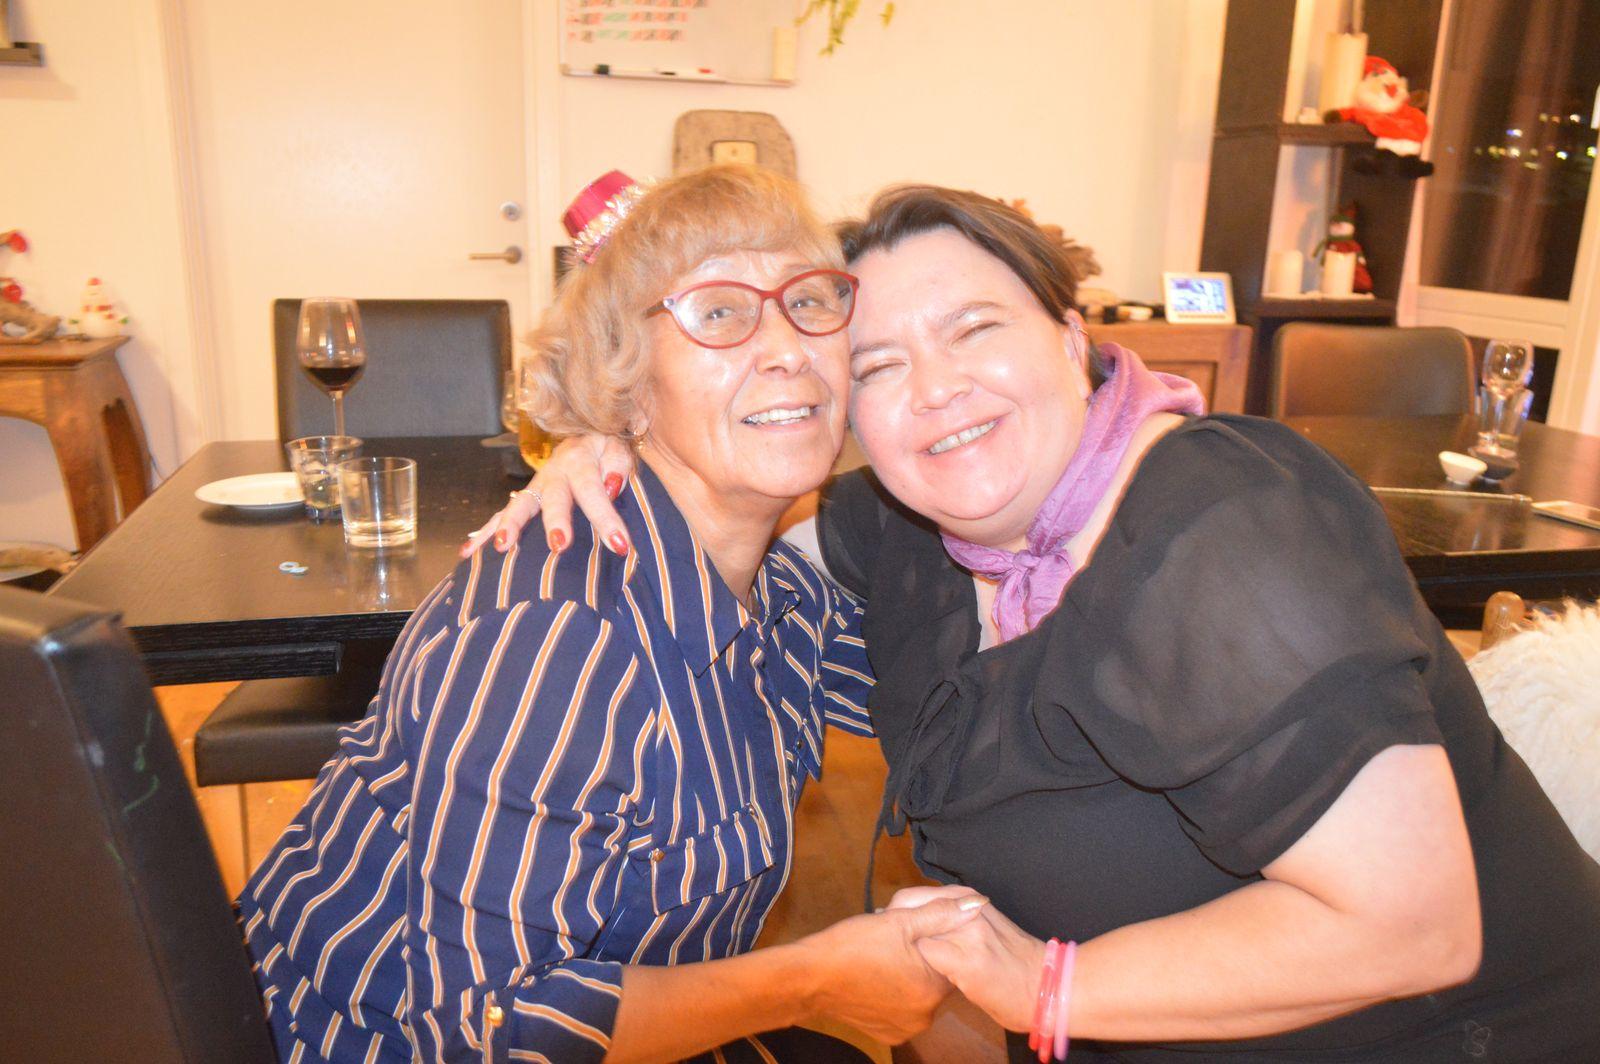 2020-01-01-0336_Anna-Hessler-Labansen-Sofie-Potter_2